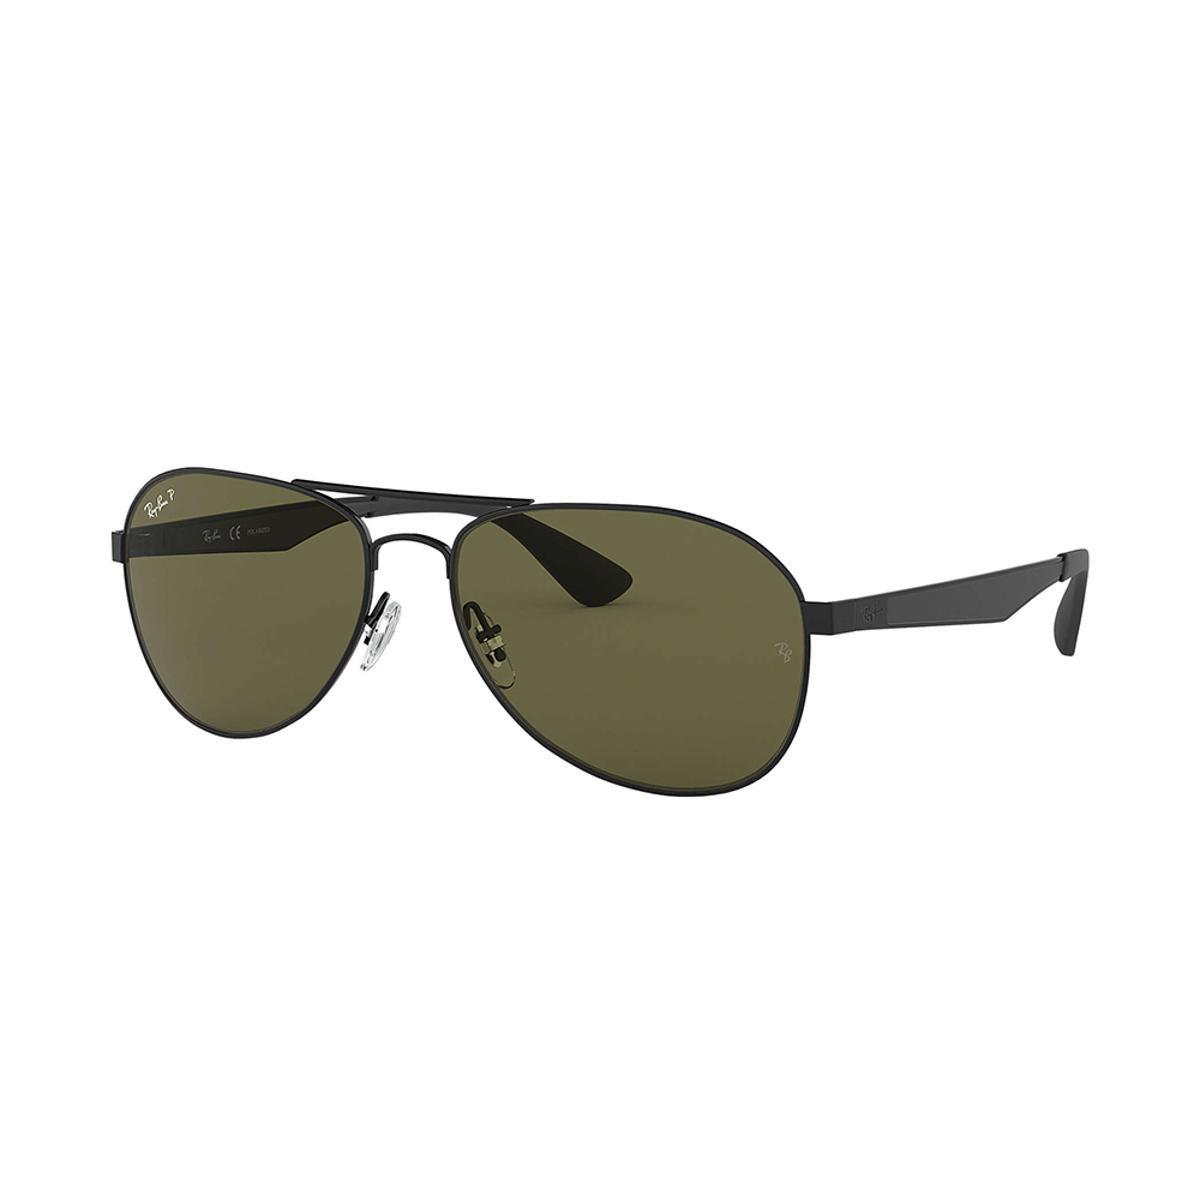 Óculos de Sol Ray-Ban RB3549 Masculino - Preto - Compre Agora   Netshoes 7b3e04d150